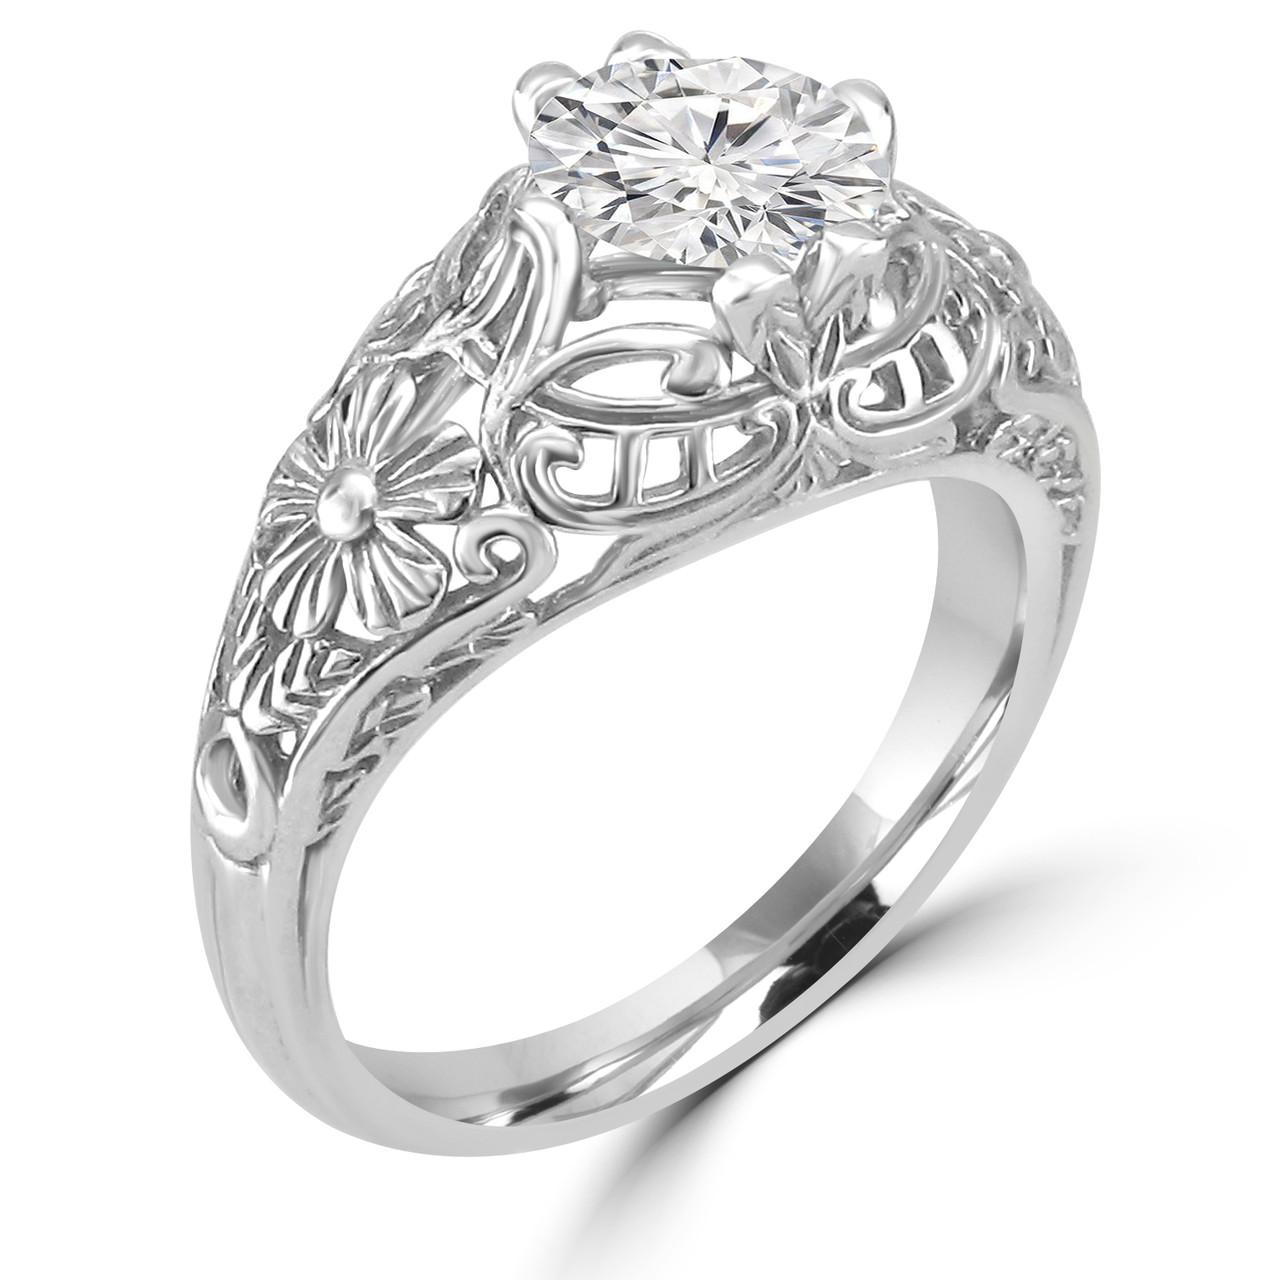 14K White Gold Vintage Inspired Engagement Ring , Shirin Style